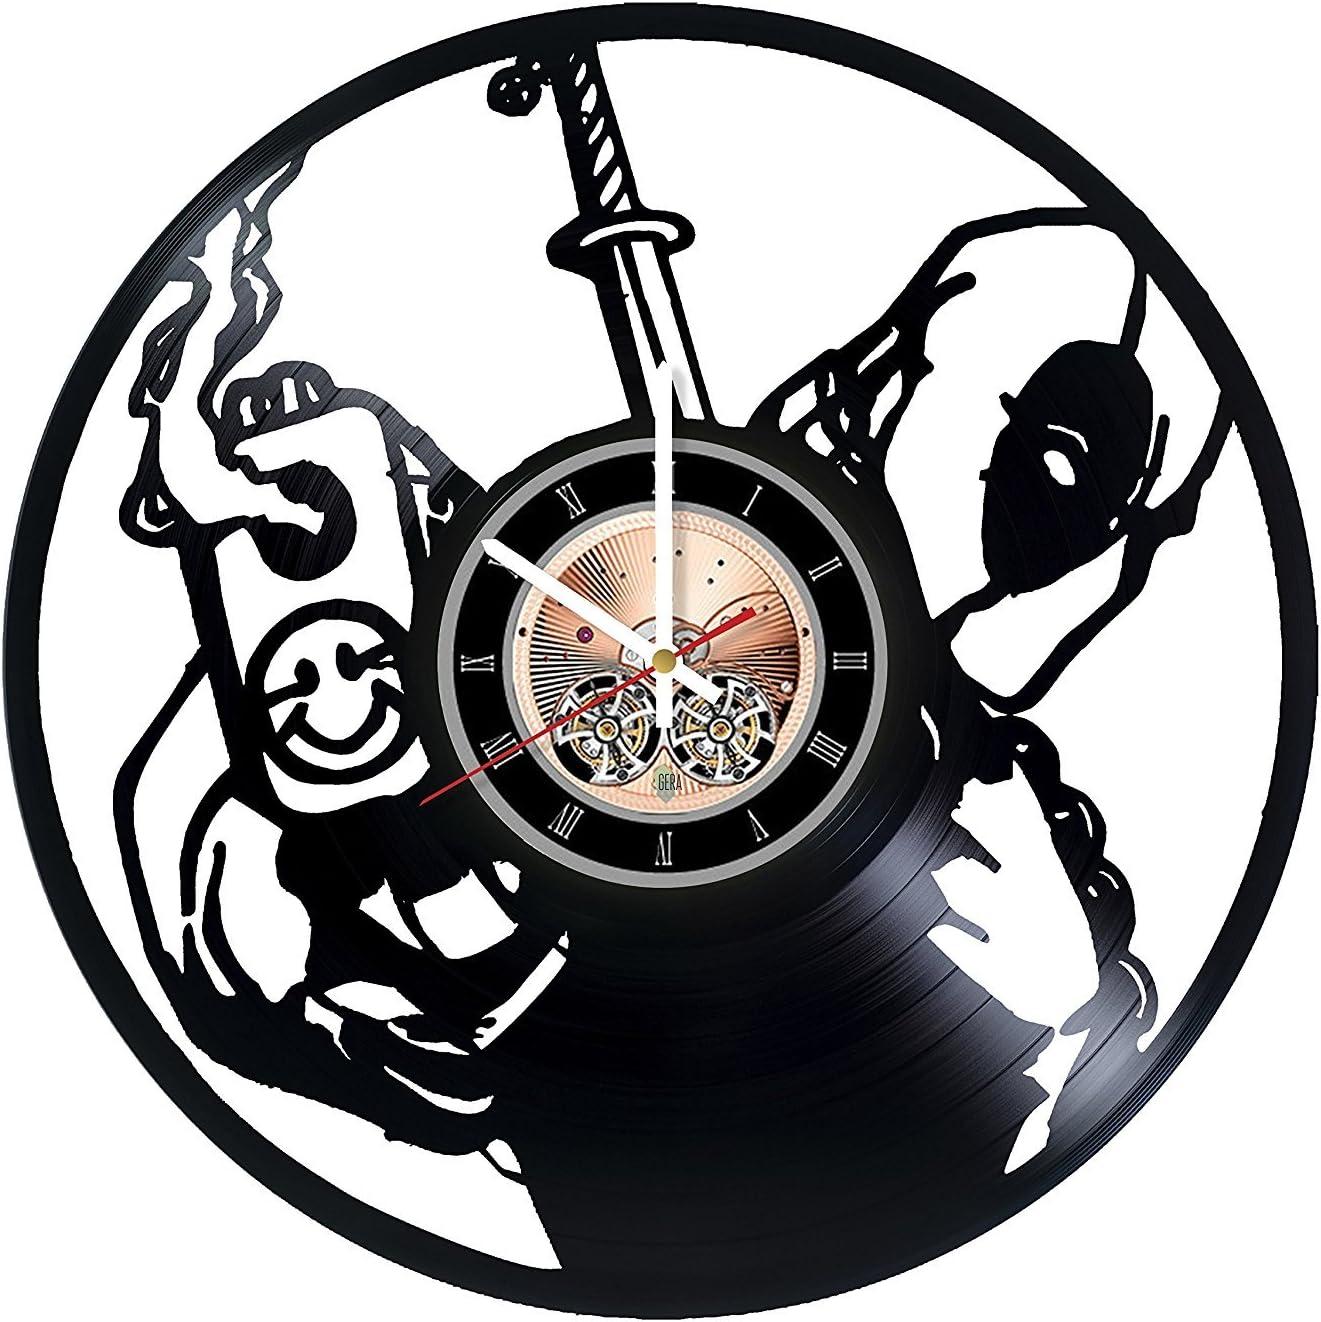 choma Deadpool Comics Vinyl Record Wall Clock - Living Room or Garage Wall Decor - Gift Ideas for Friends, Teens, Men, Boys – Free Movies Unique Art Design